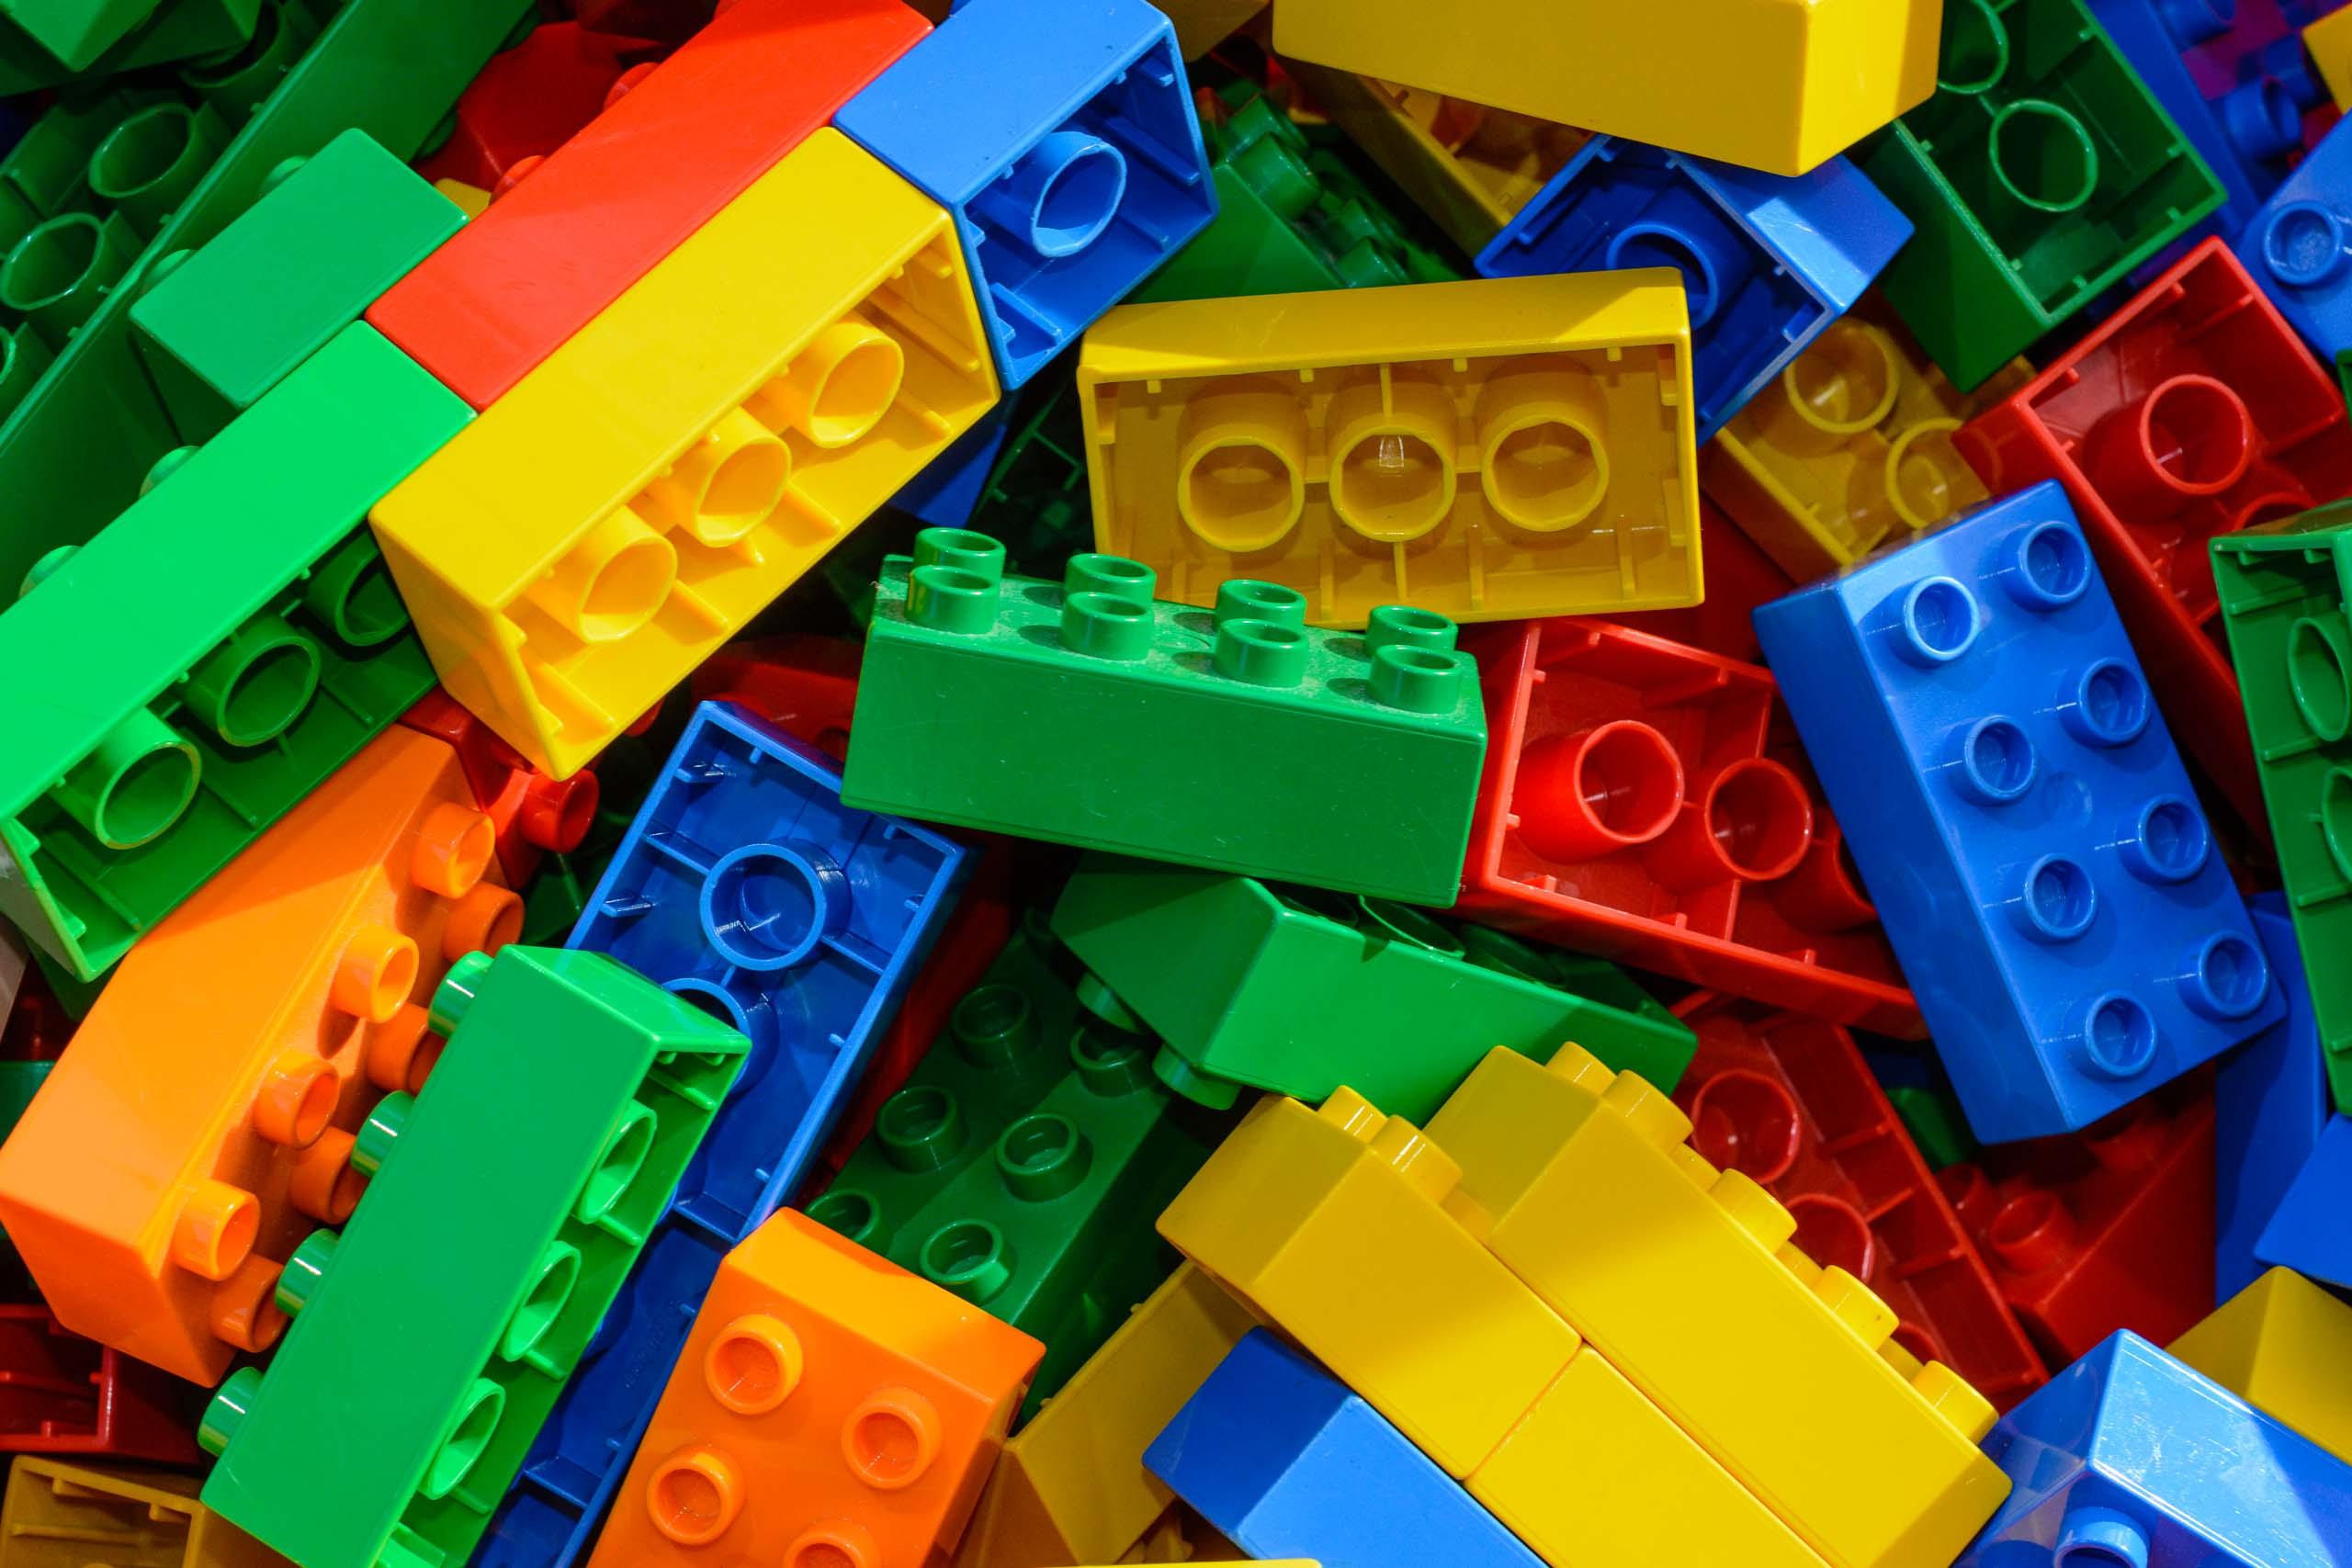 lego,baukloetze,spielzeug,lego,farbig,bunt,rot,gruen,gelb,blau